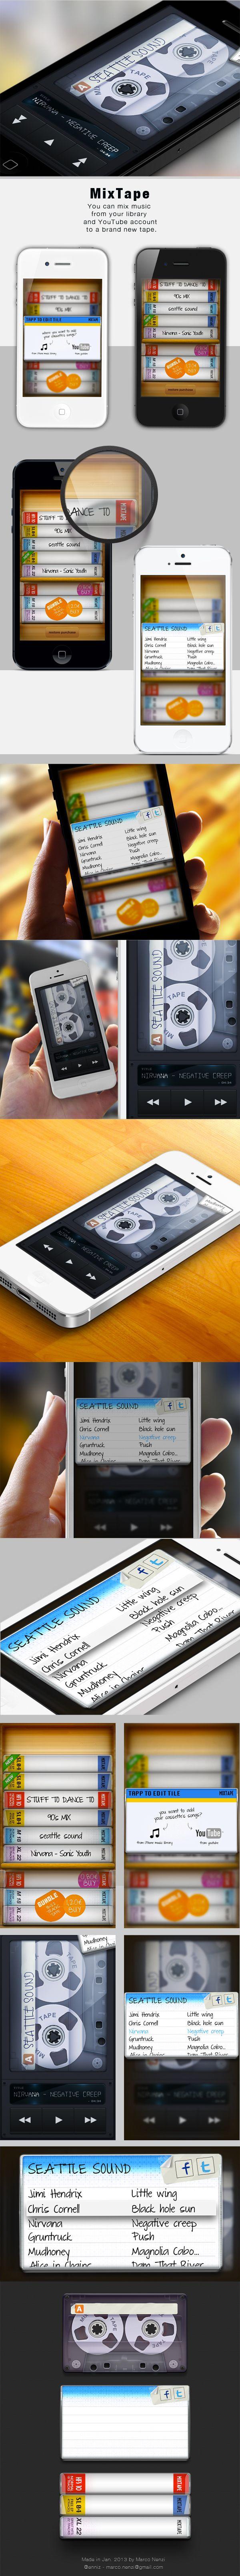 MixTape - iOS Music App - by Marco Nenzi, via Behance | snaps ...